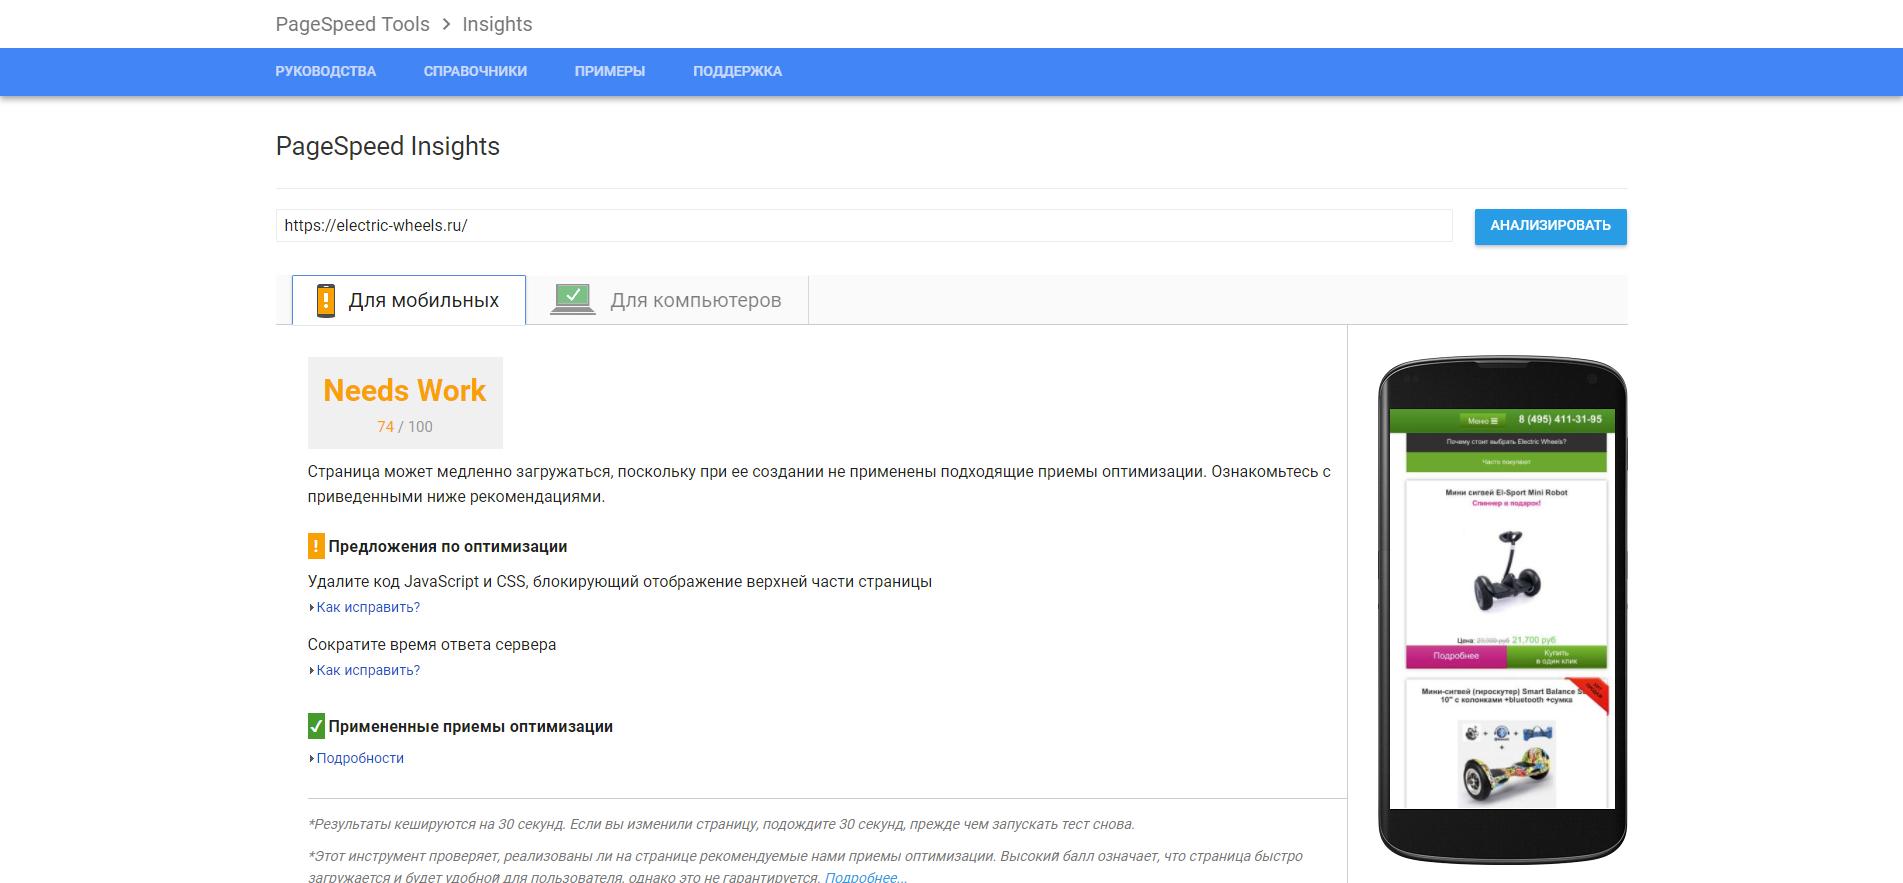 Google PageSpeed оптимизация скорости загрузки сайта интернет-магазина гироскутеров и электротранспорта Electric Wheels